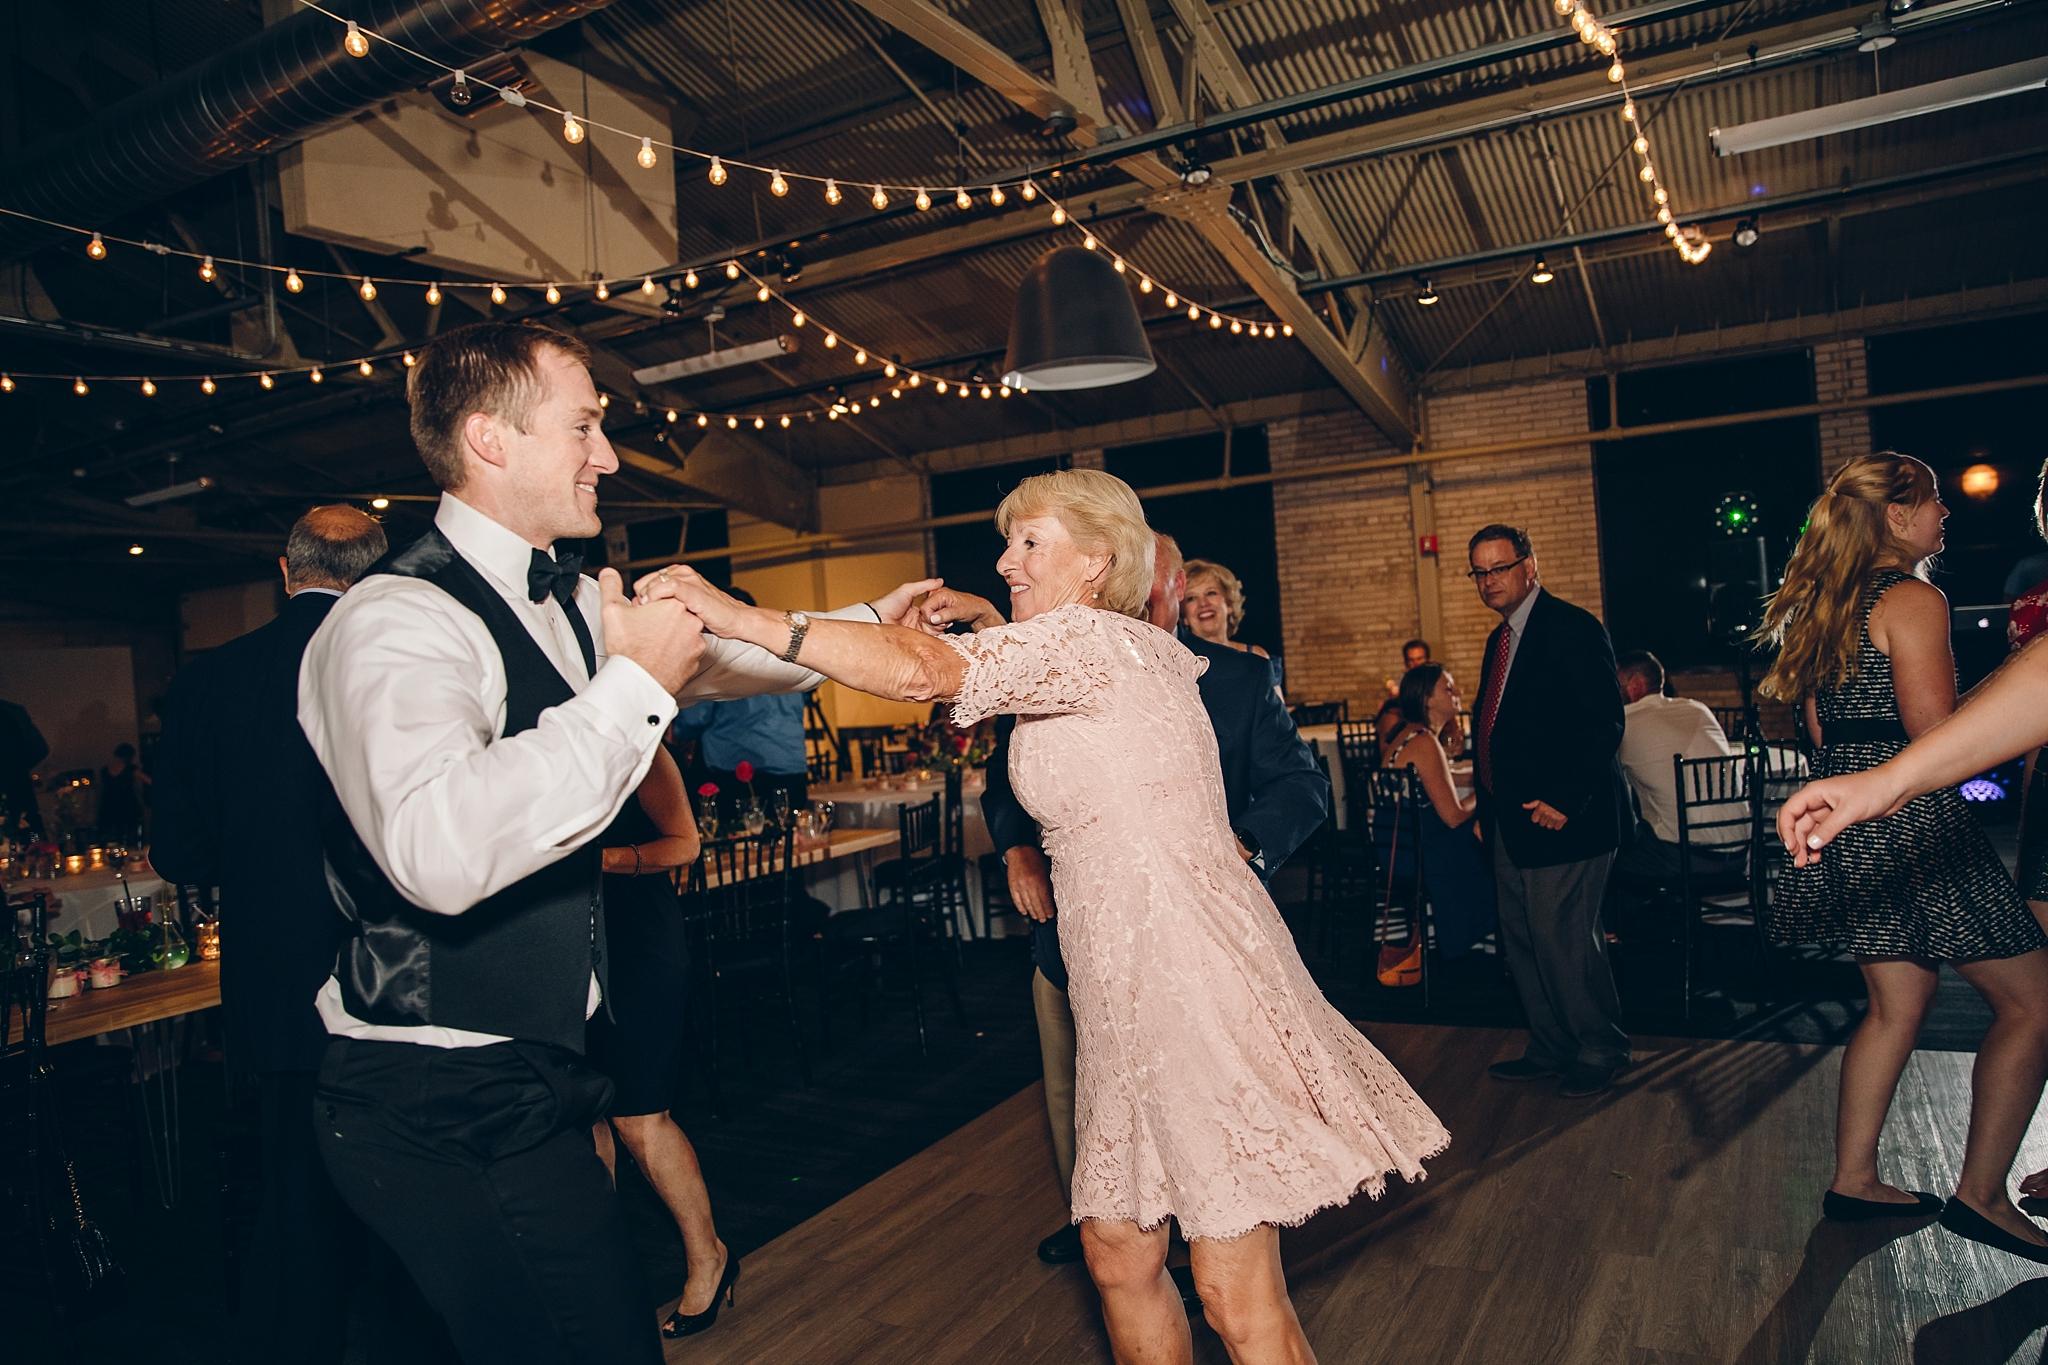 baker-lofts-holland-michigan-wedding-photographer_0404.jpg